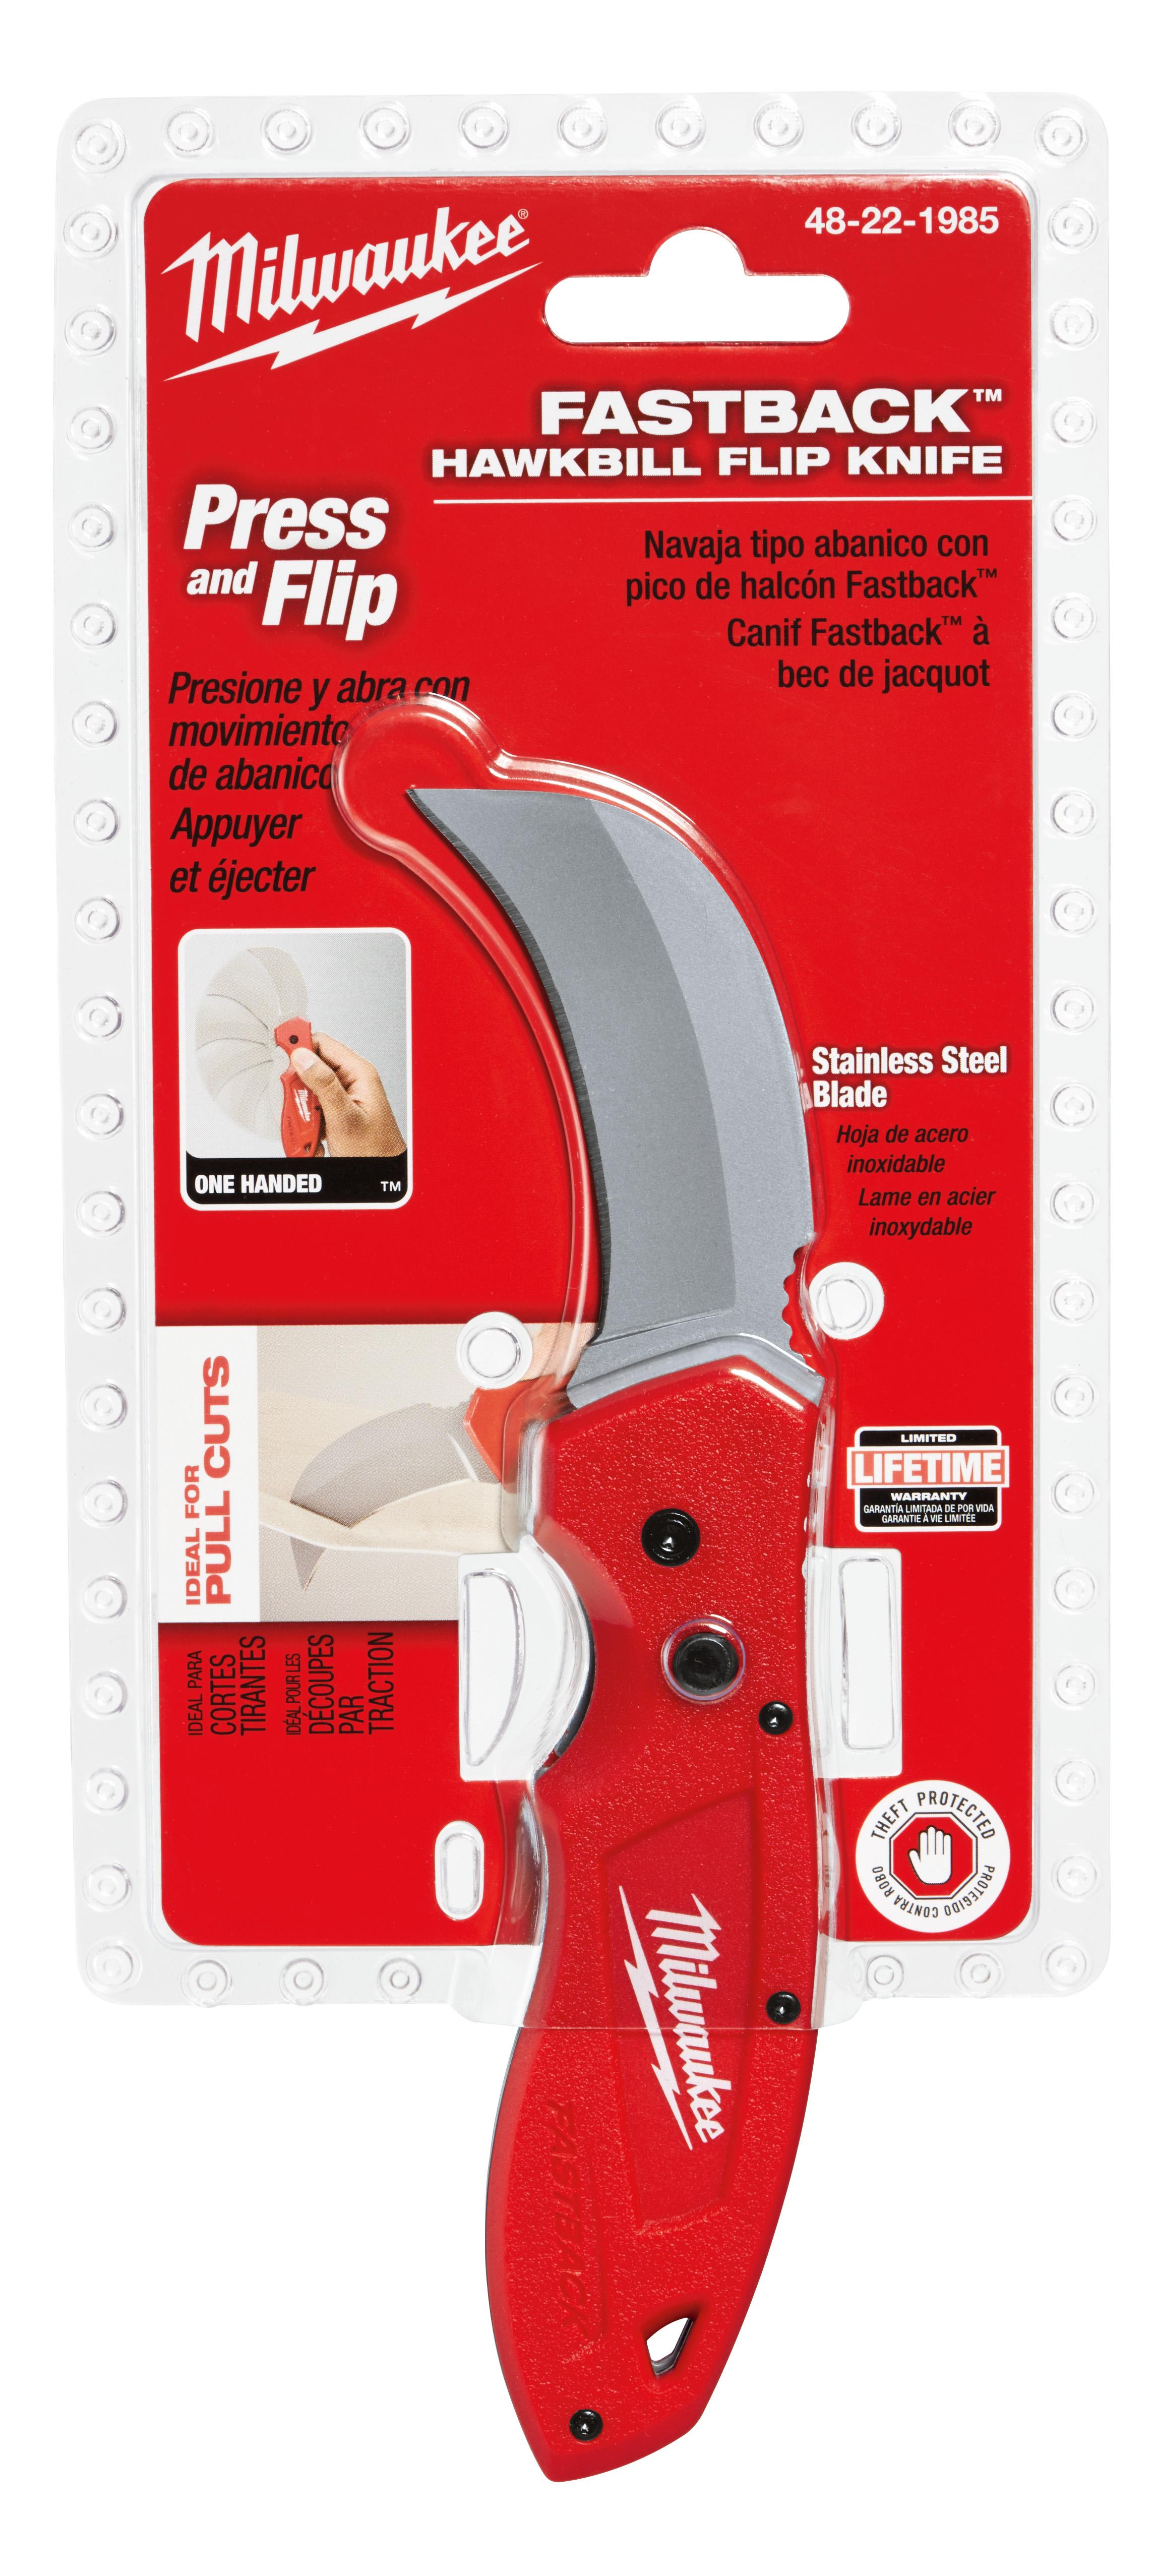 Klein® 1550-6 Lockable Pocket Knife With Screwdriver, 2-3/8 in L Blade, Curve Sheepfoot Standard Spear Point Carbon Steel Blade